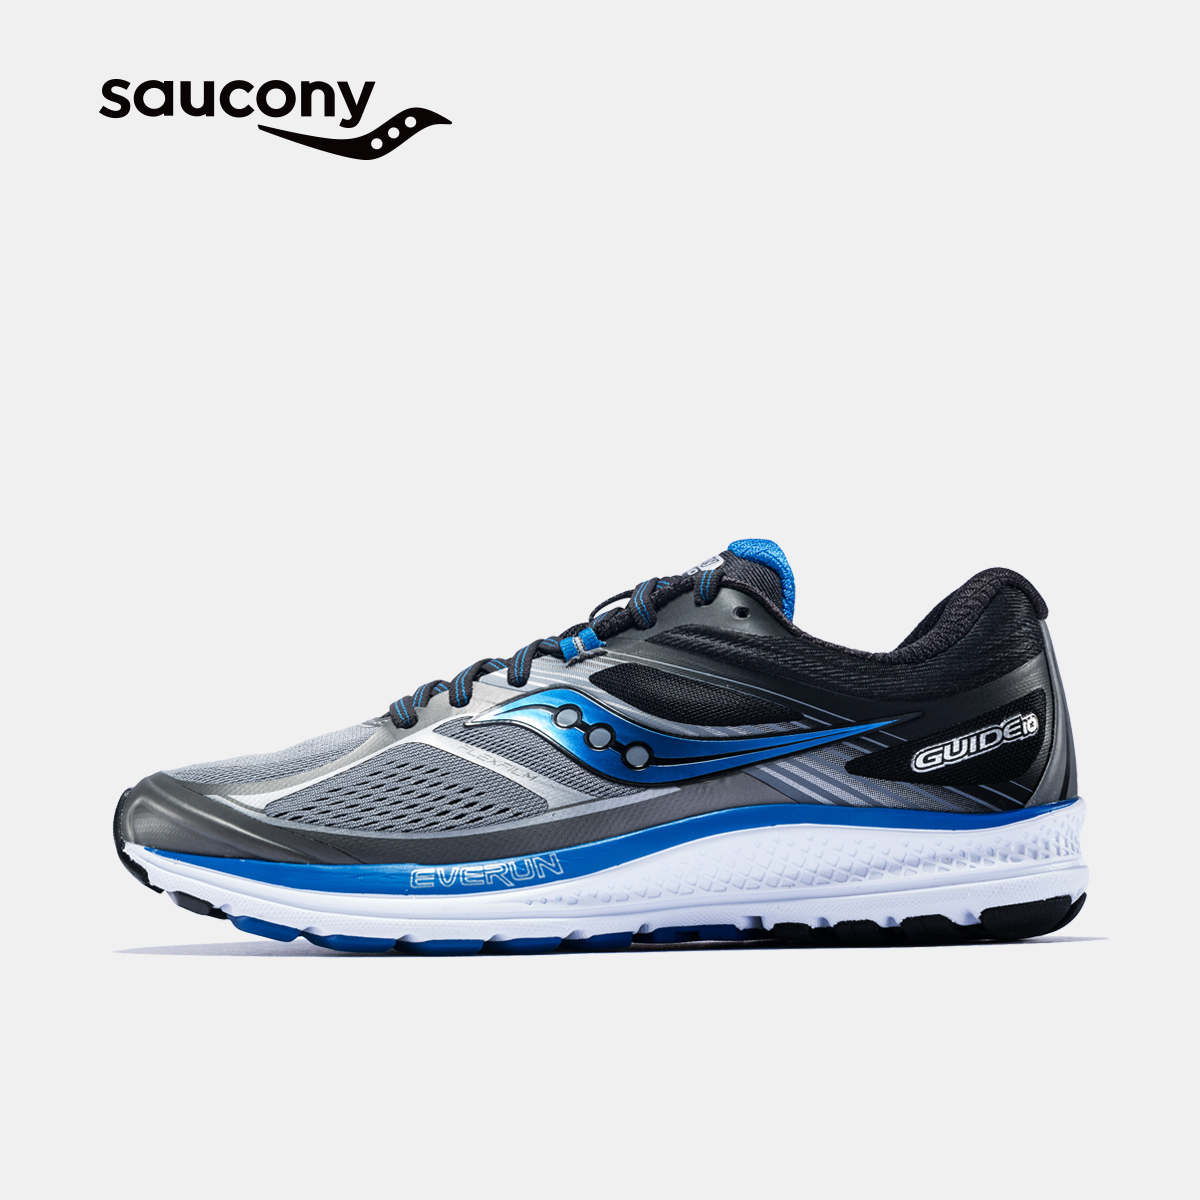 Saucony圣康尼GUIDE 10稳定支撑运动鞋 男子跑步鞋 S20350-A